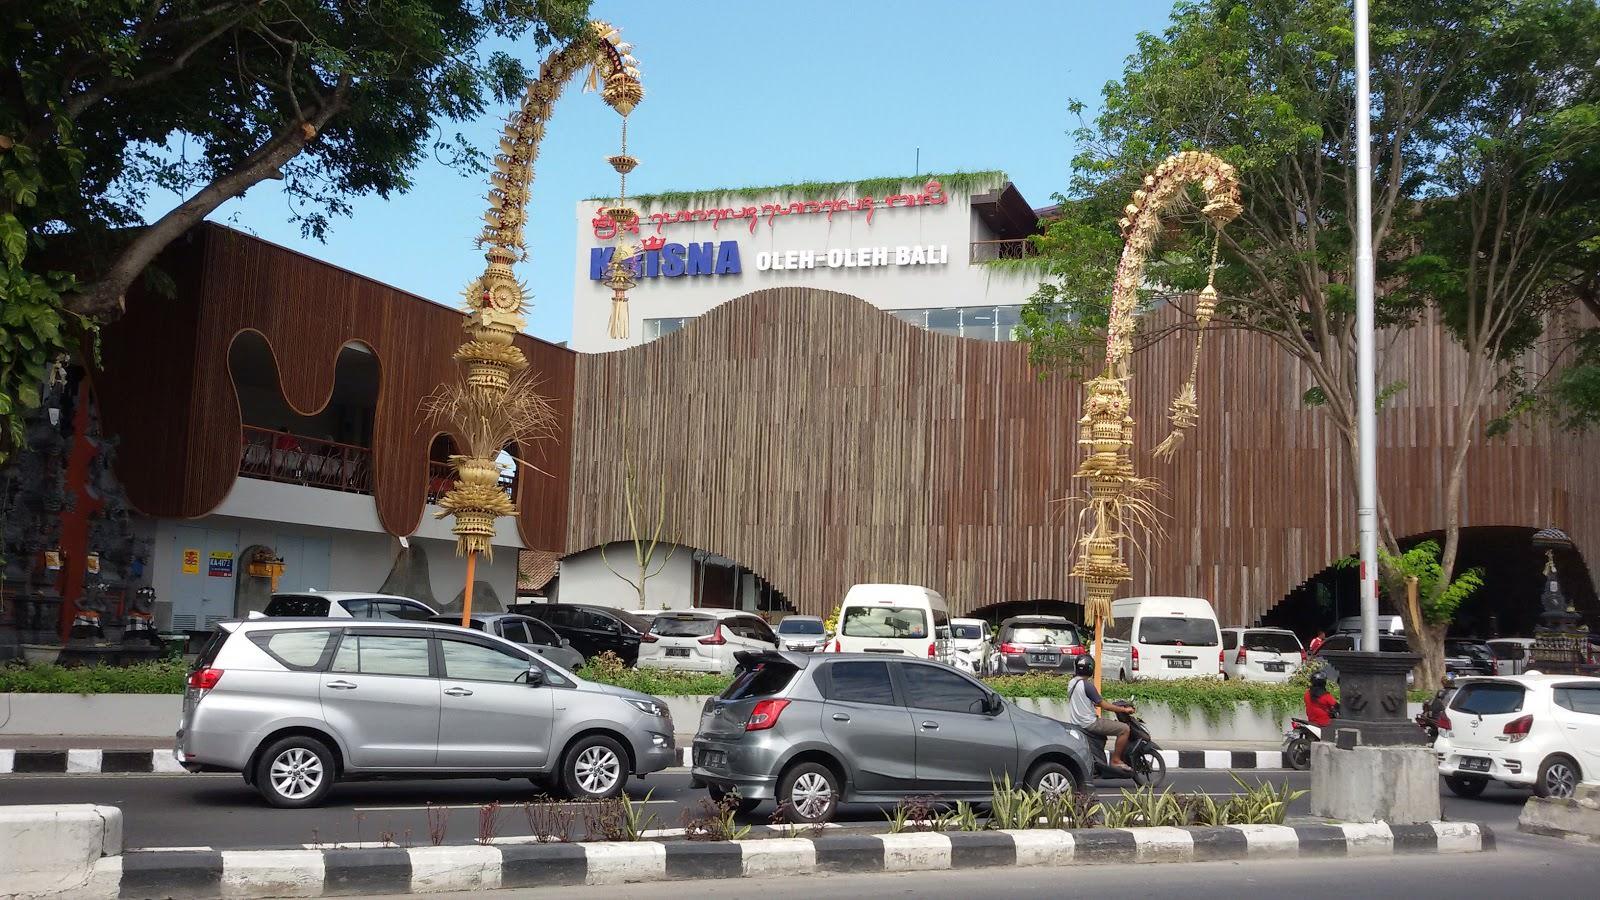 krisna bali oleh oleh » Krisna Bali dan The Keranjang Bali Hadir Sebagai Pusat Oleh Oleh Terbesar di Pulau Dewata